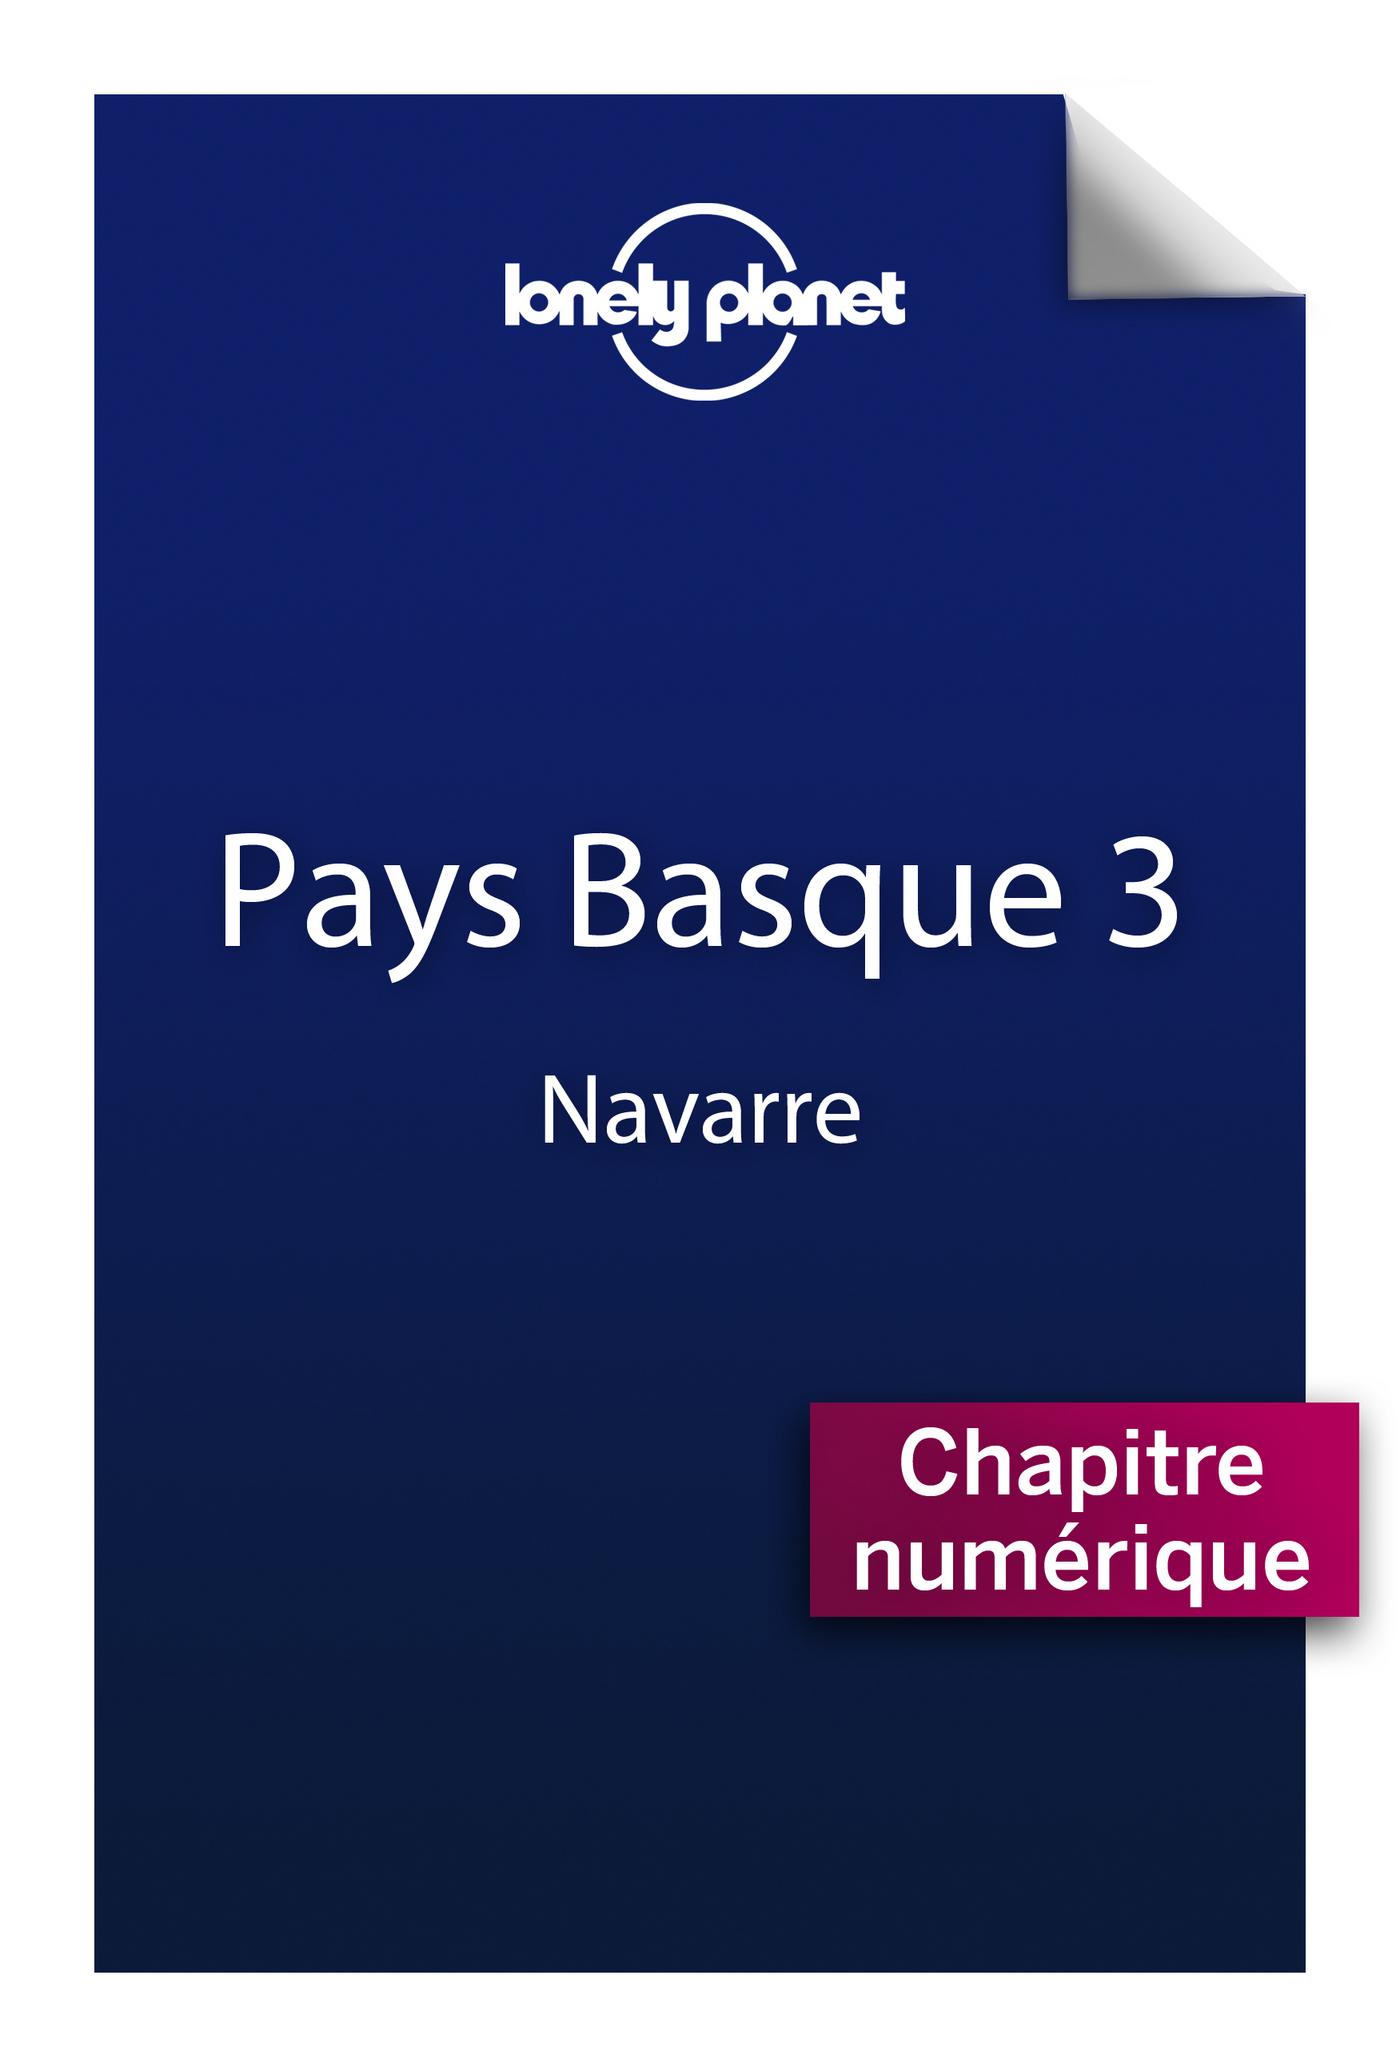 Pays basque 3 - Navarre